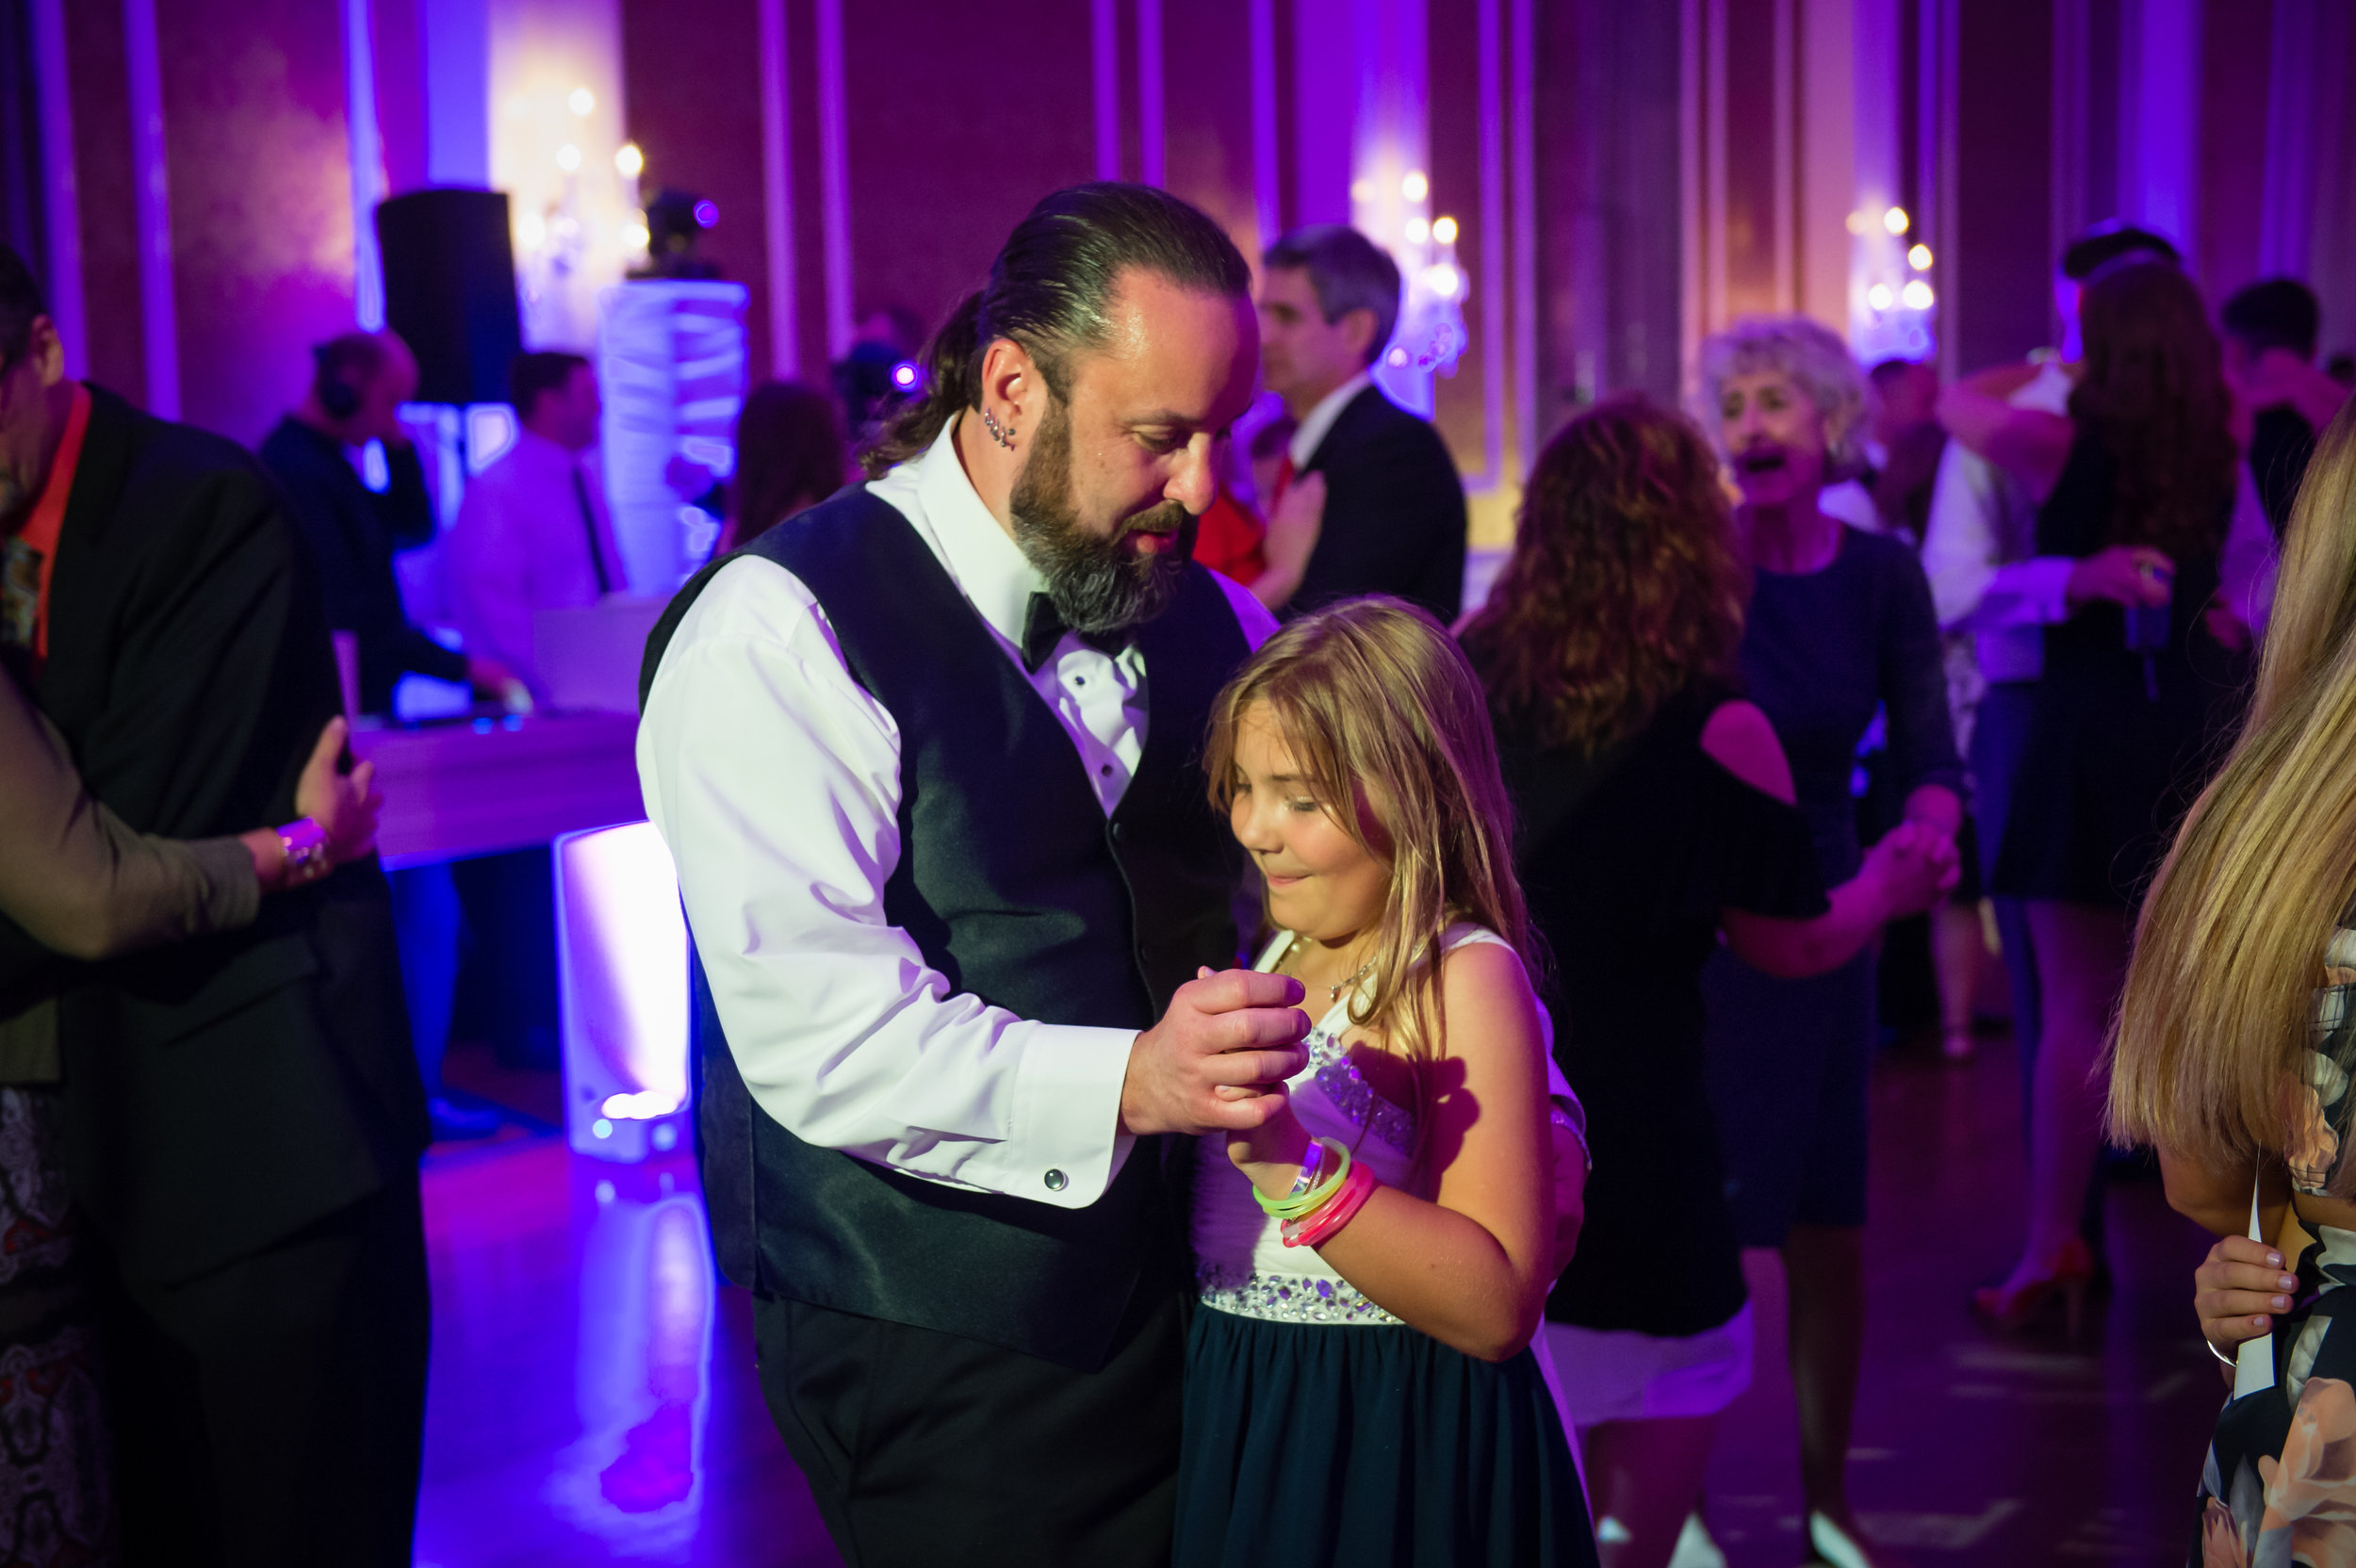 Garelli_Maitland-Smith_Wedding_781.jpg